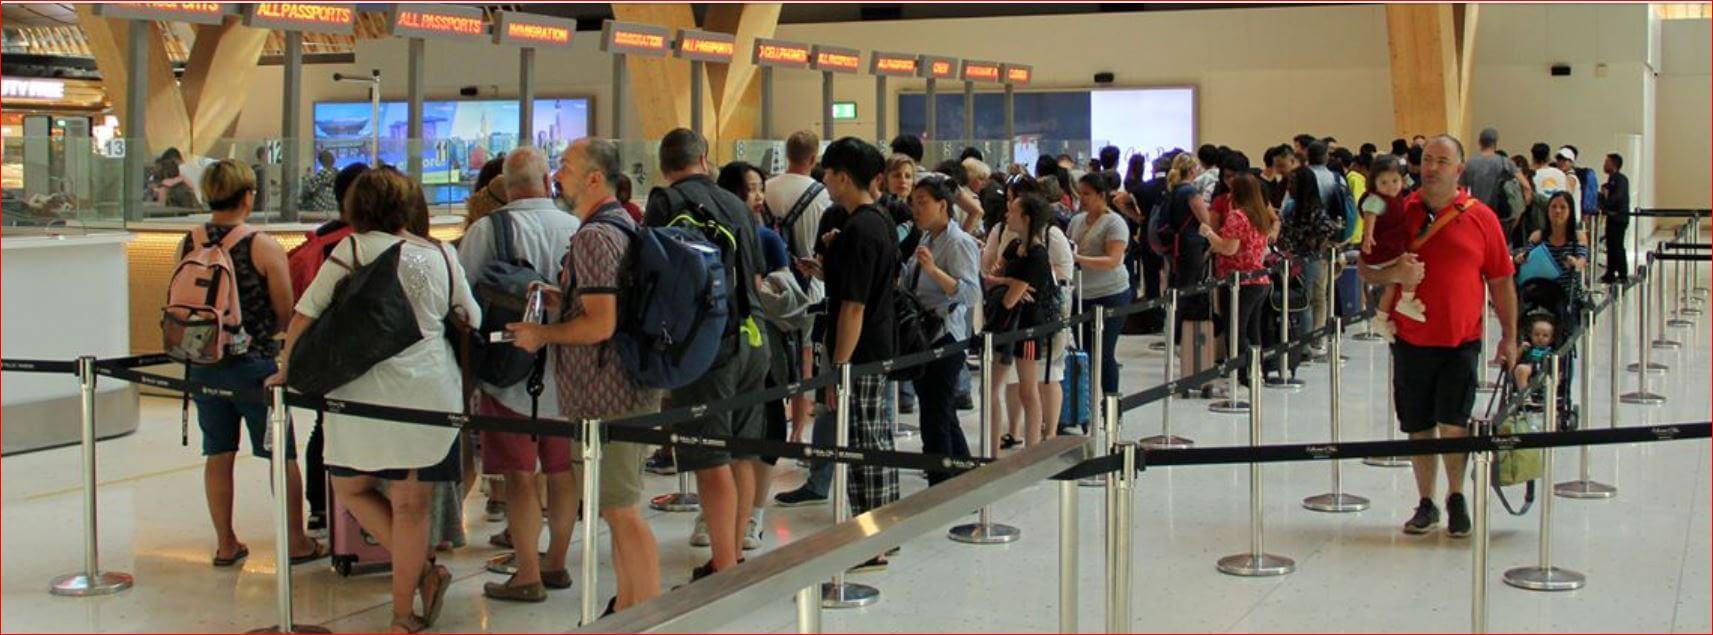 Philippines revenue inbound tourism